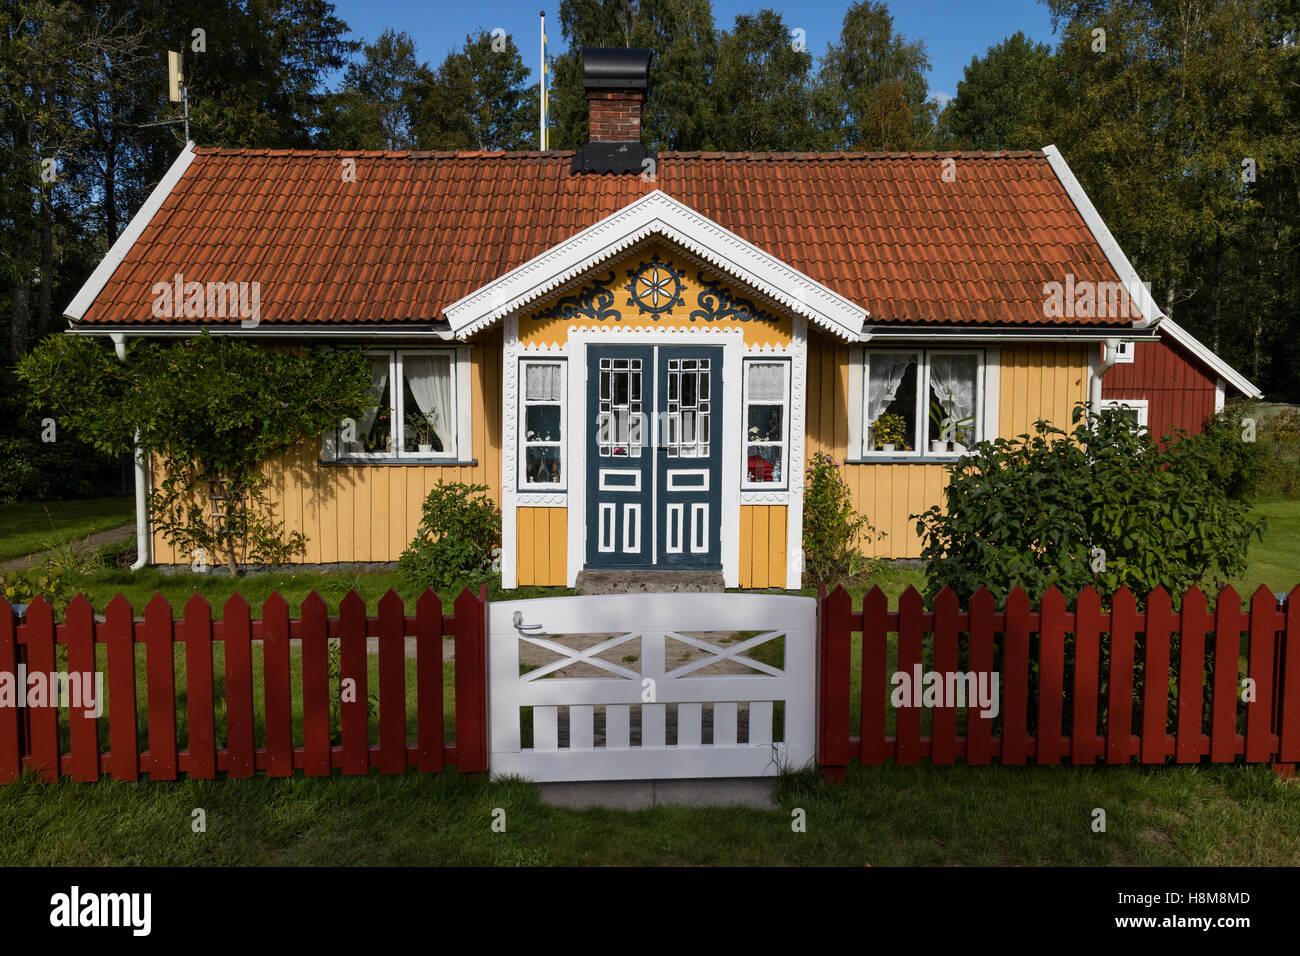 Front porch in Bolmen, Sweden - Stock Image